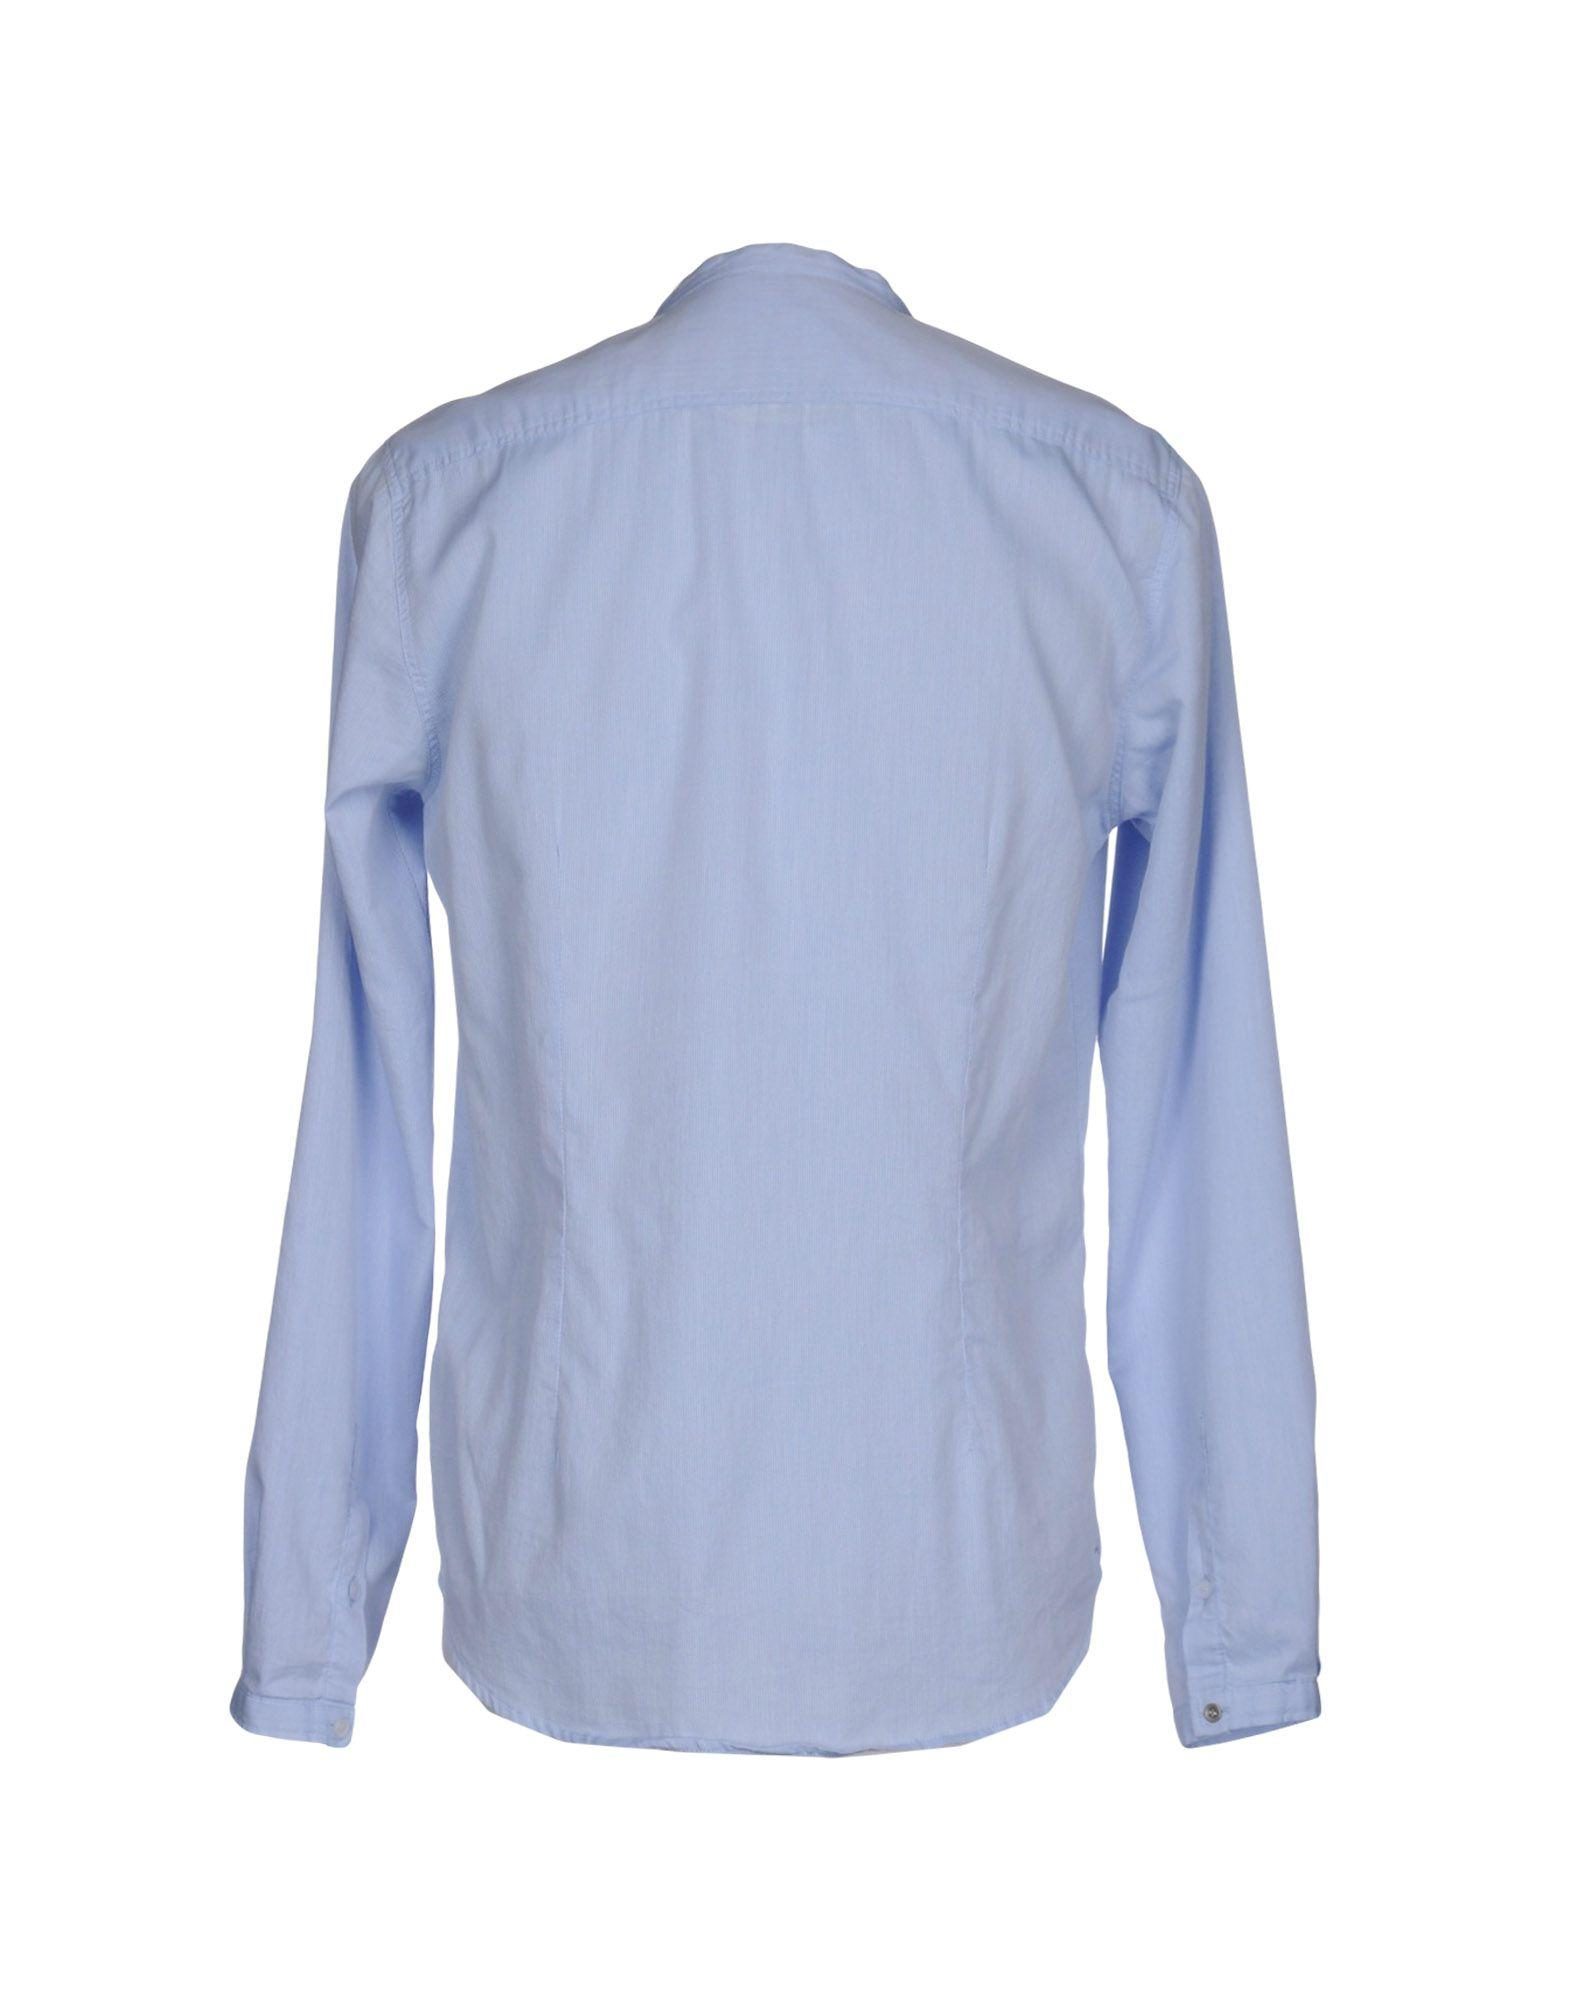 Officina 36 Shirt In Blue For Men Lyst